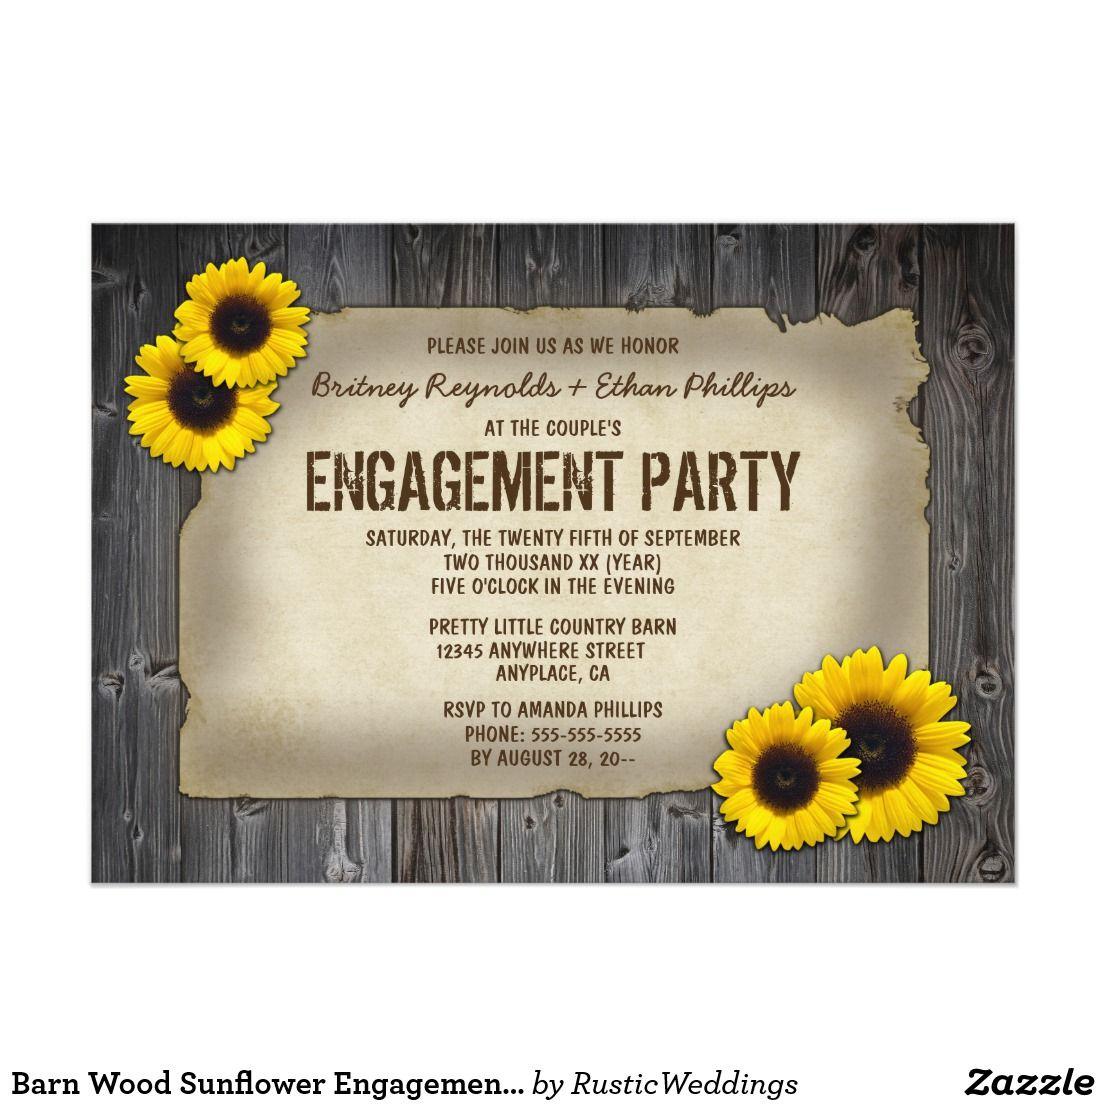 Barn Wood Sunflower Engagement Party Invitations Vintage Barn Wood ...